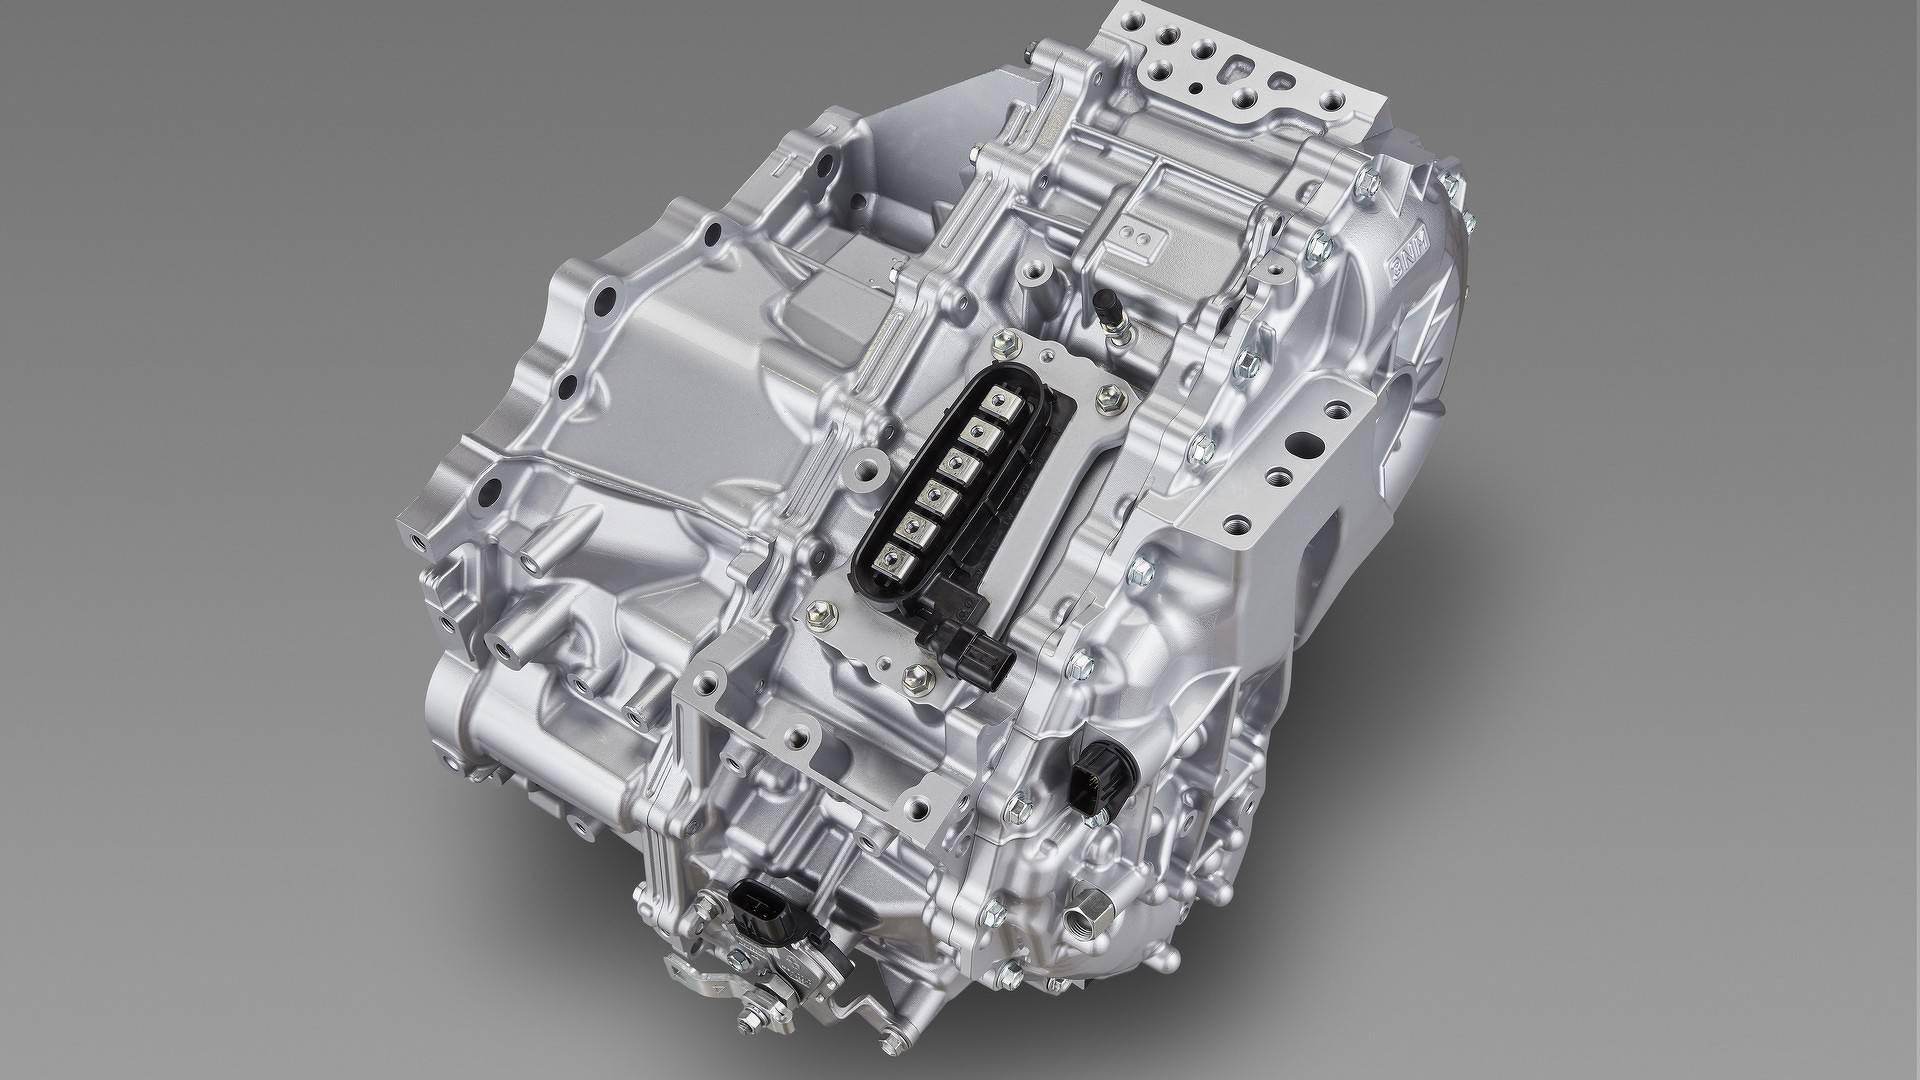 2019 Toyota Auris With Hybrid 2 0-Liter Engine Teased